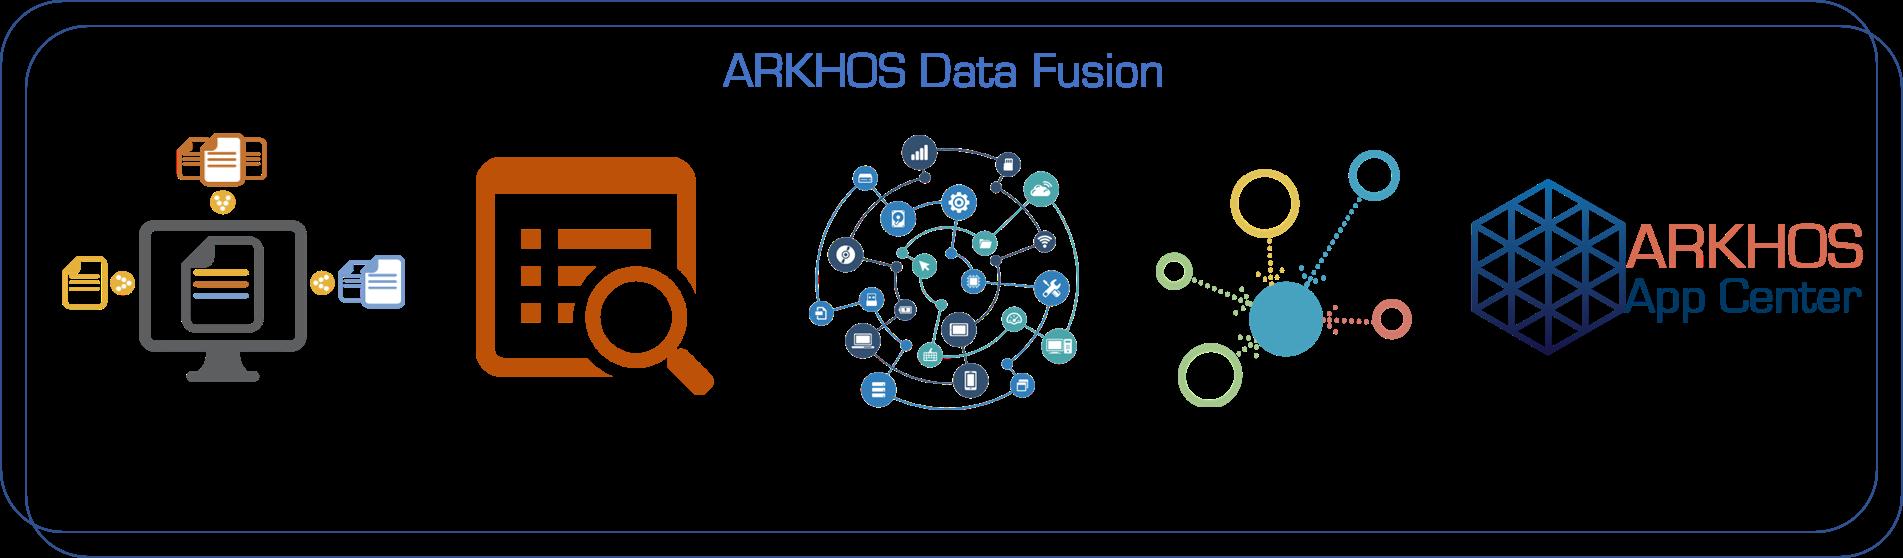 Arkhos Data Fusion